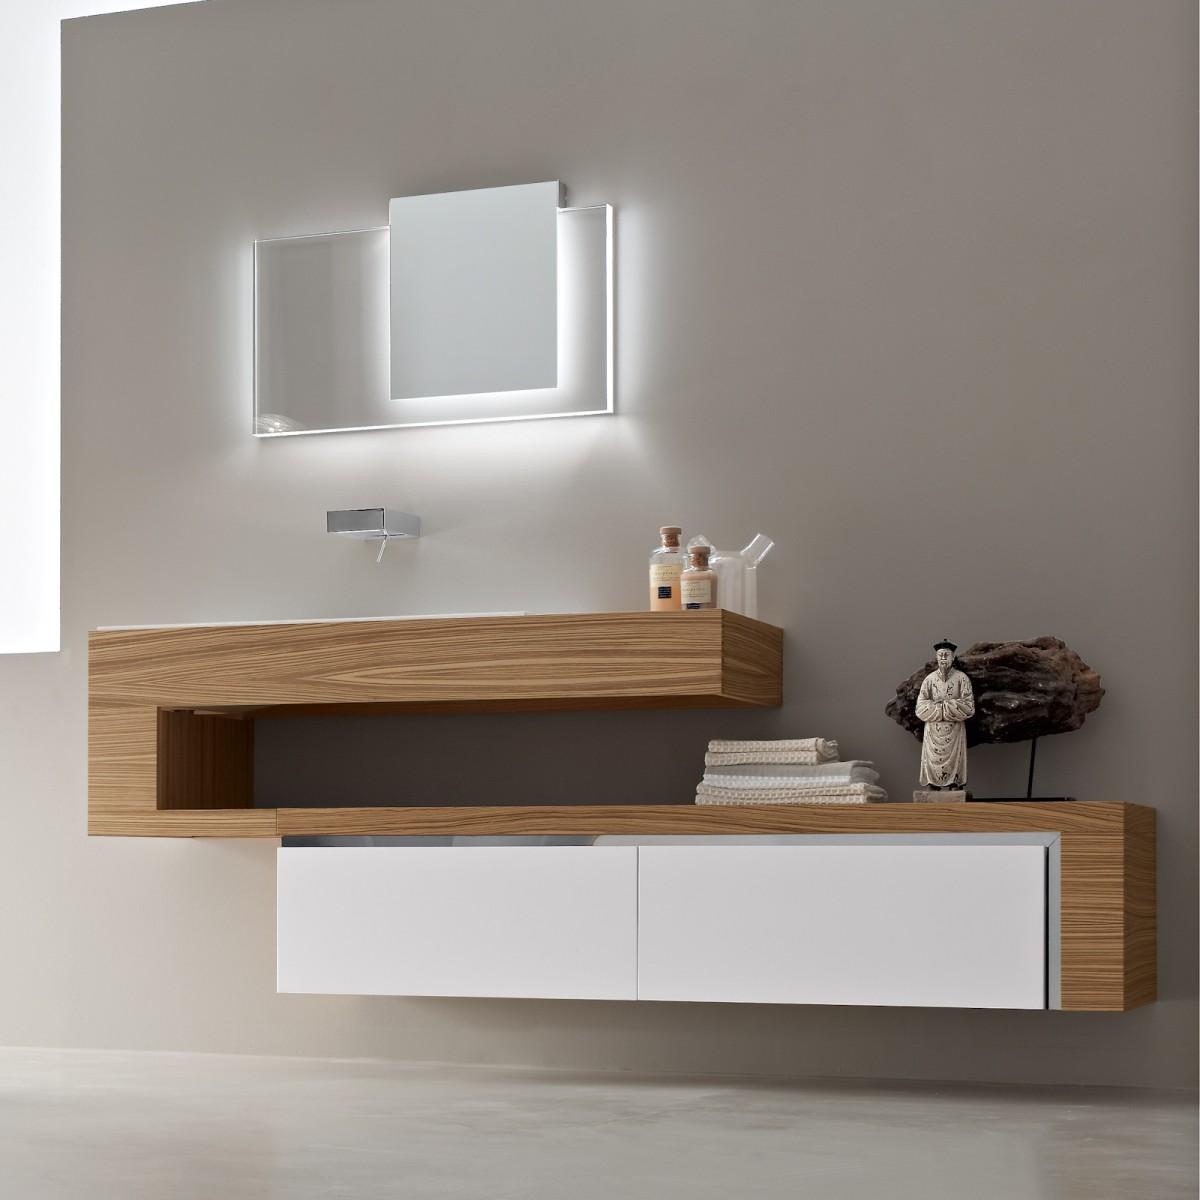 Built in bathroom furniture